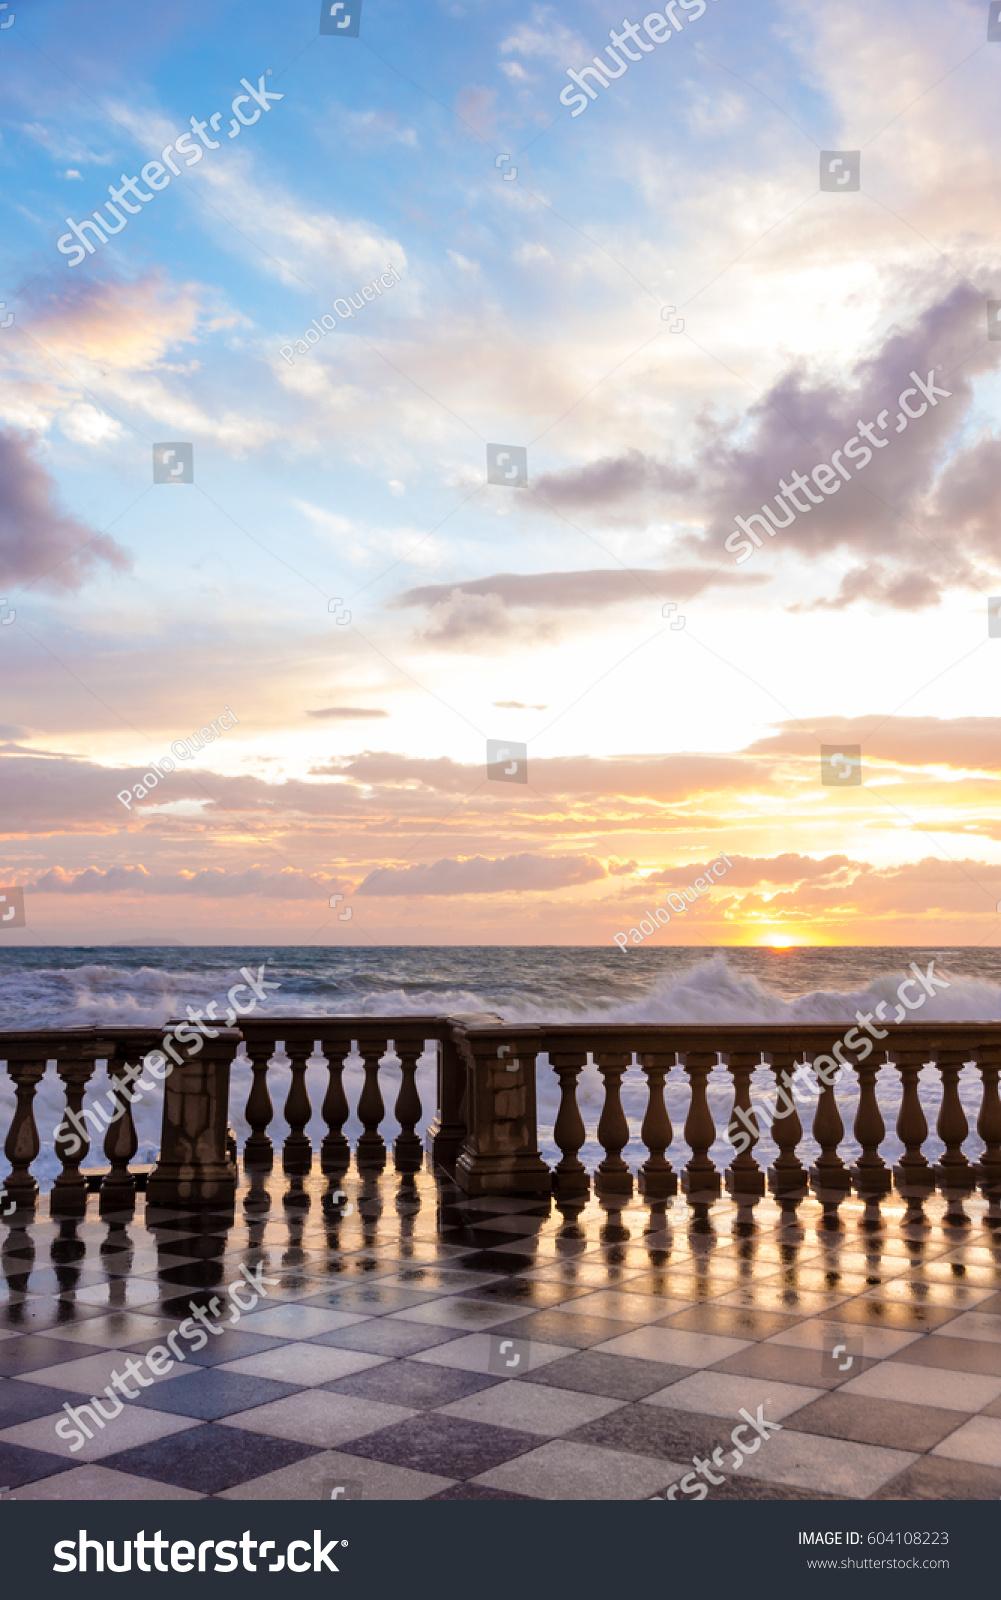 Terrazza Mascagni Livorno Sunset Stock Photo (Royalty Free ...